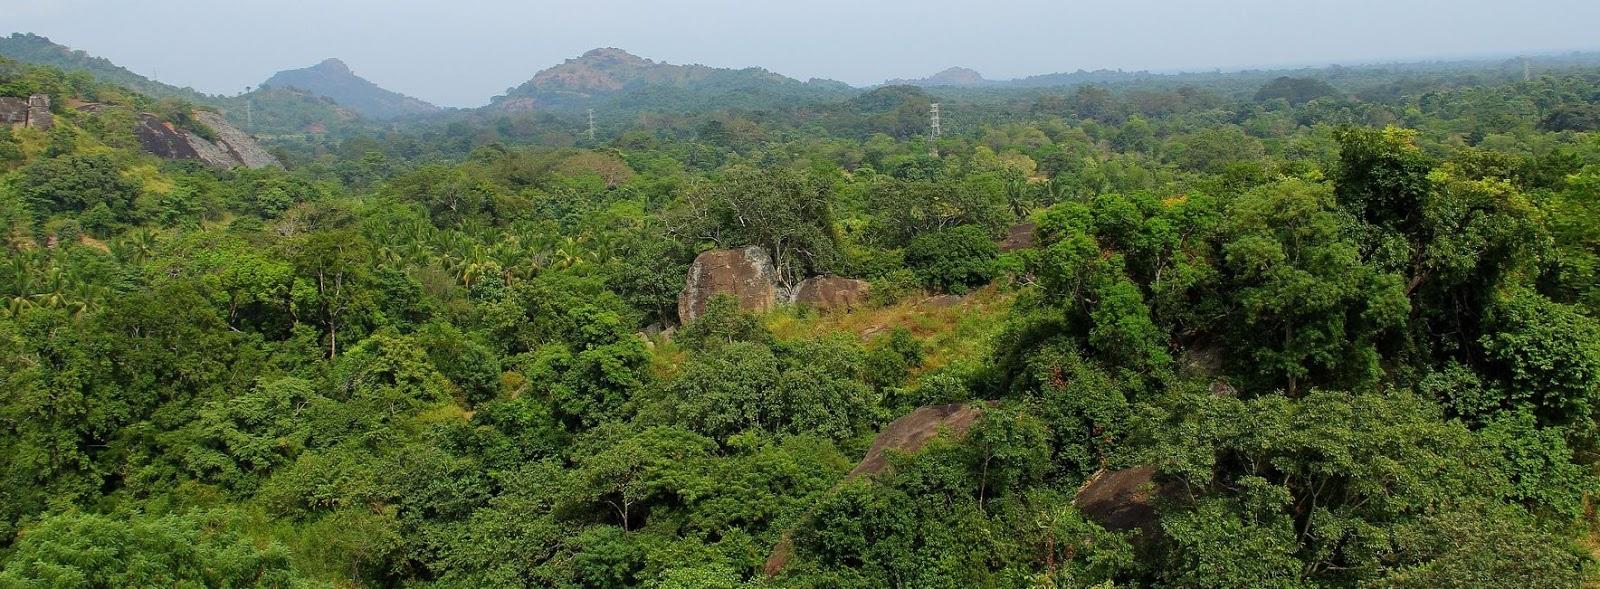 Rock outcrop habitat of Cnemaspis kotagamai sp. nov. at Bambaragala isolated forest hill, Ratnapura District, Sri Lanka